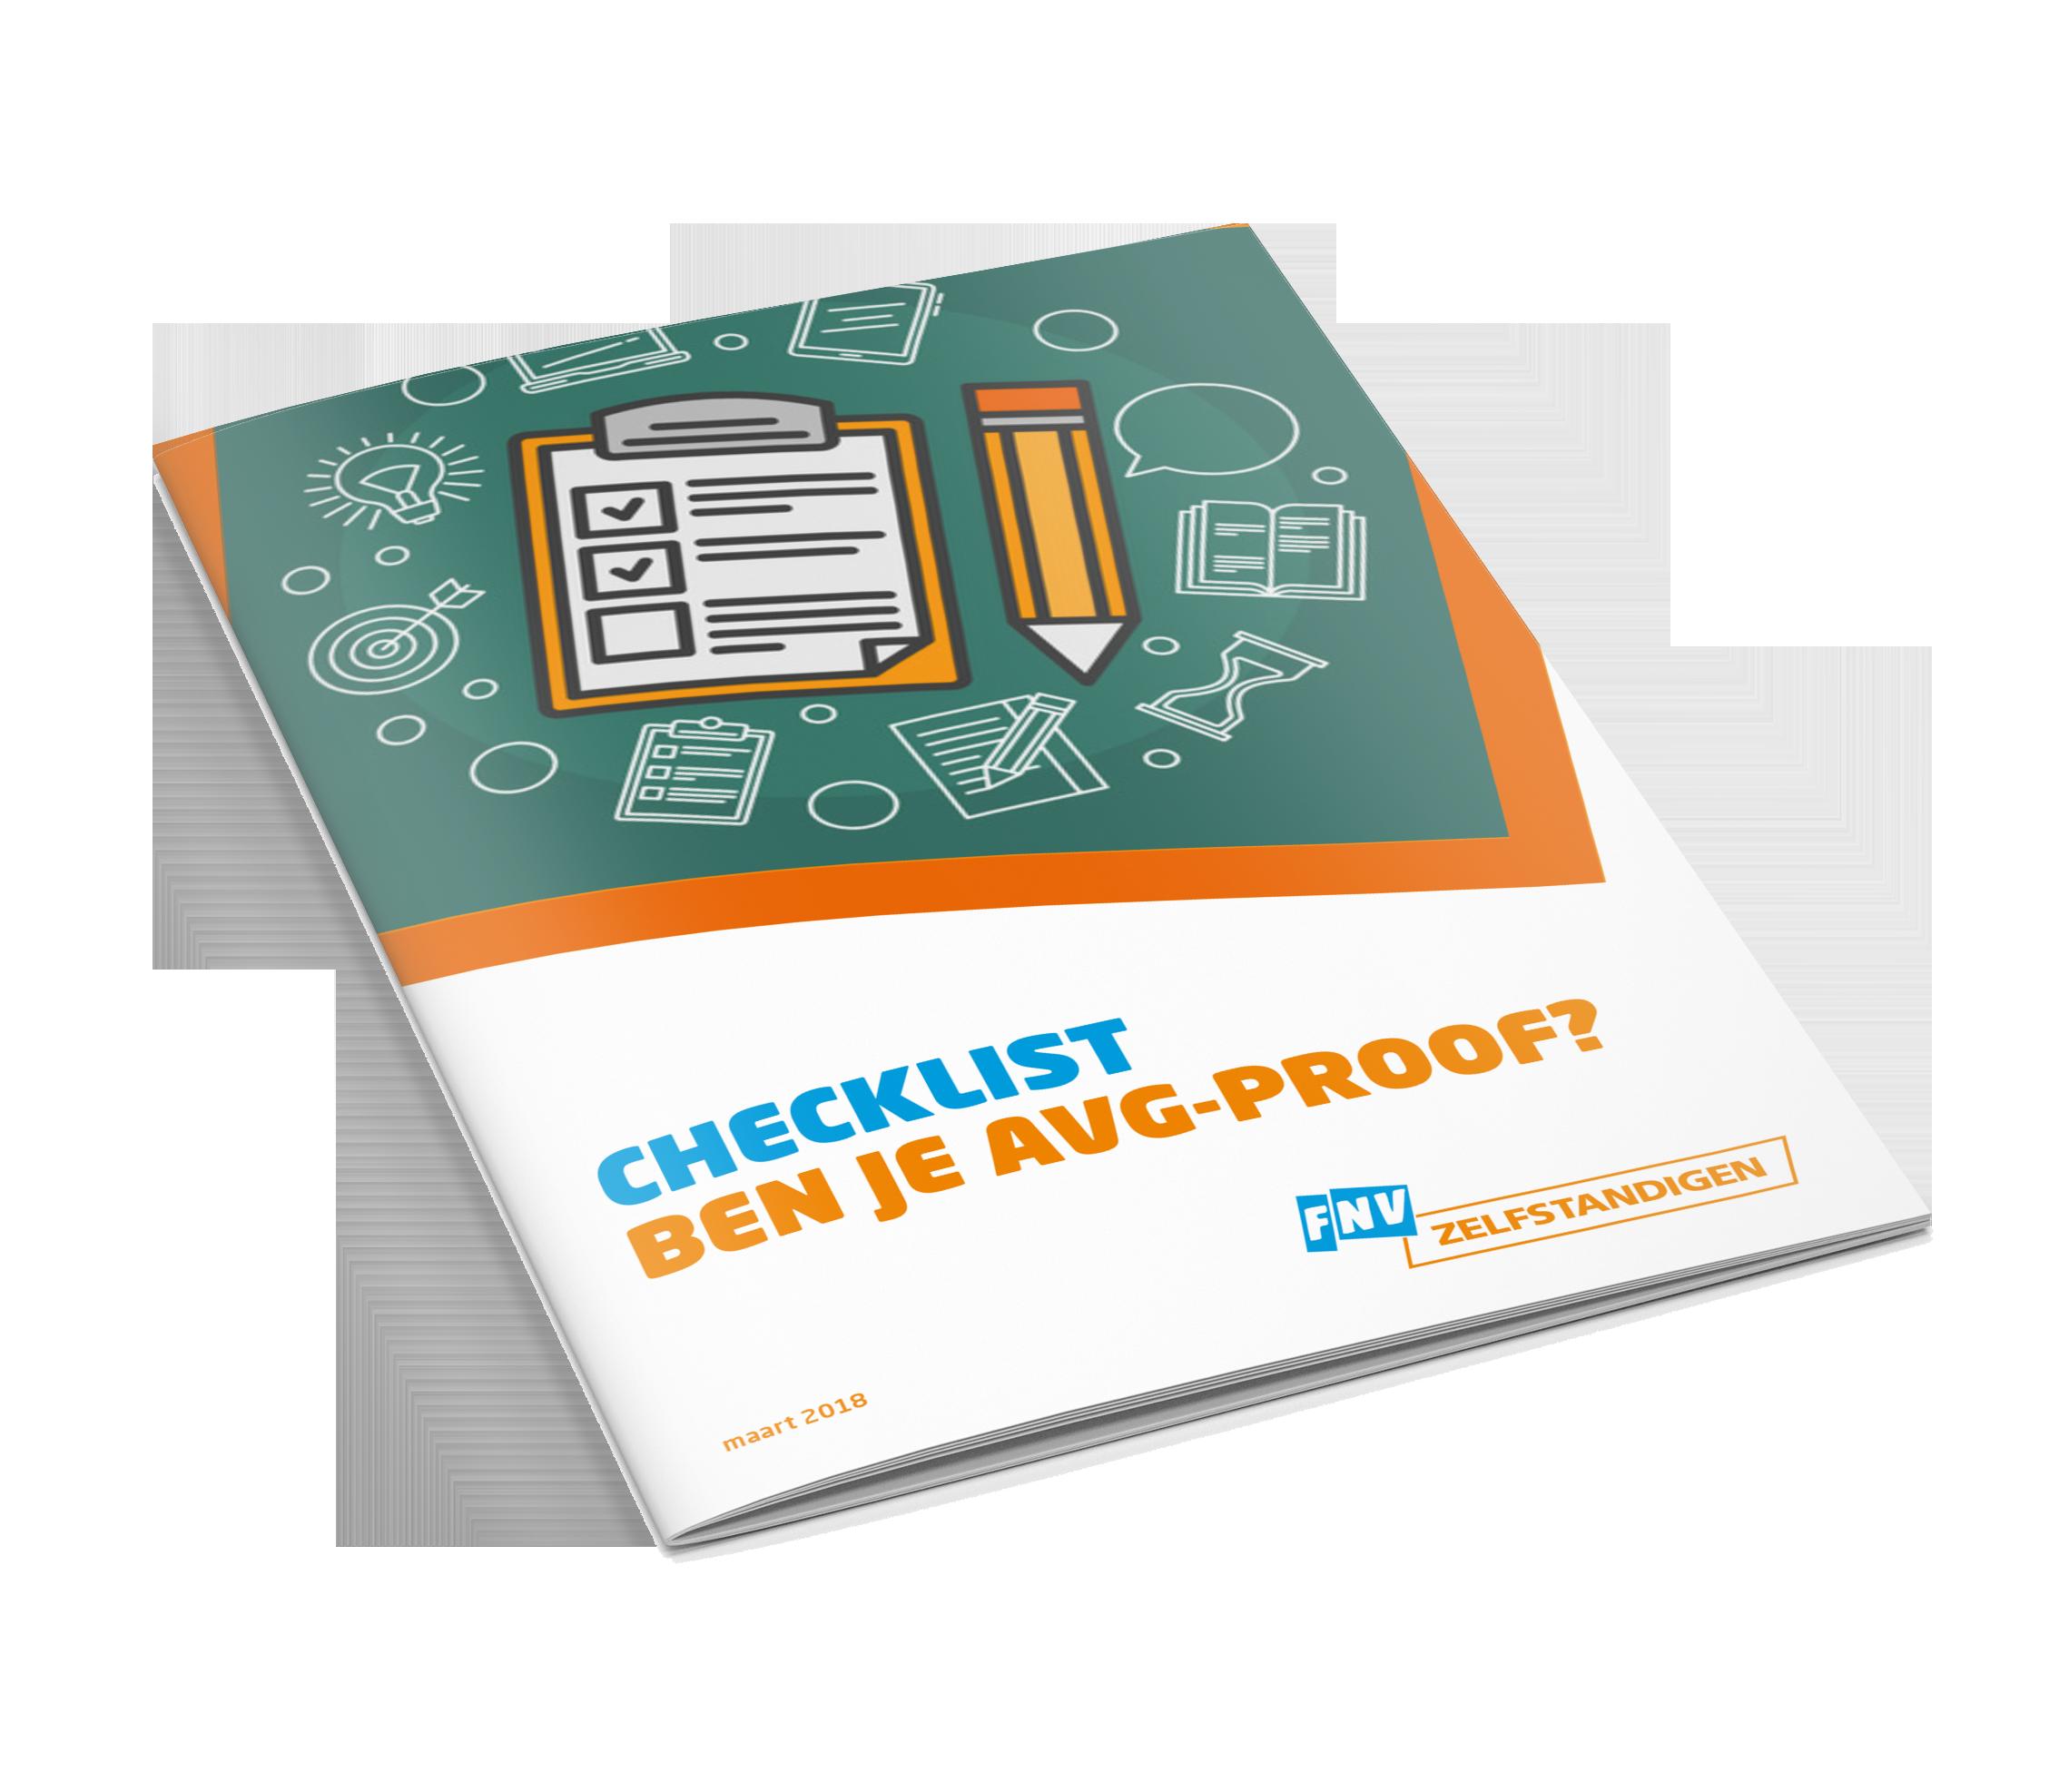 Checklist-ben-je-AVG-proof